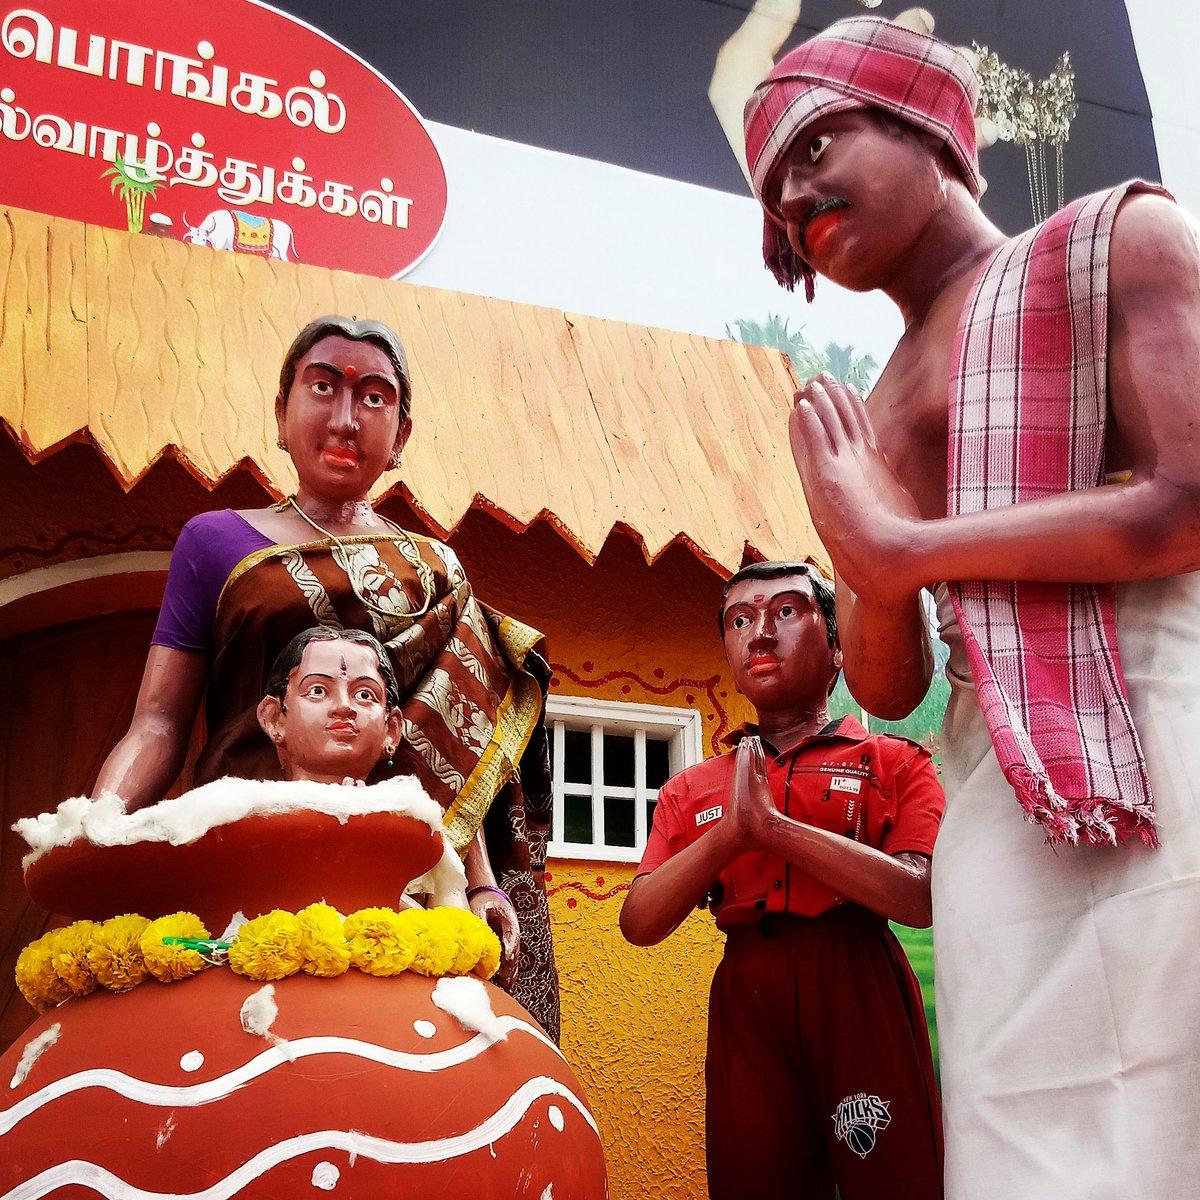 #Pongal #decorations at #saravanastores #chennai #tamil #family